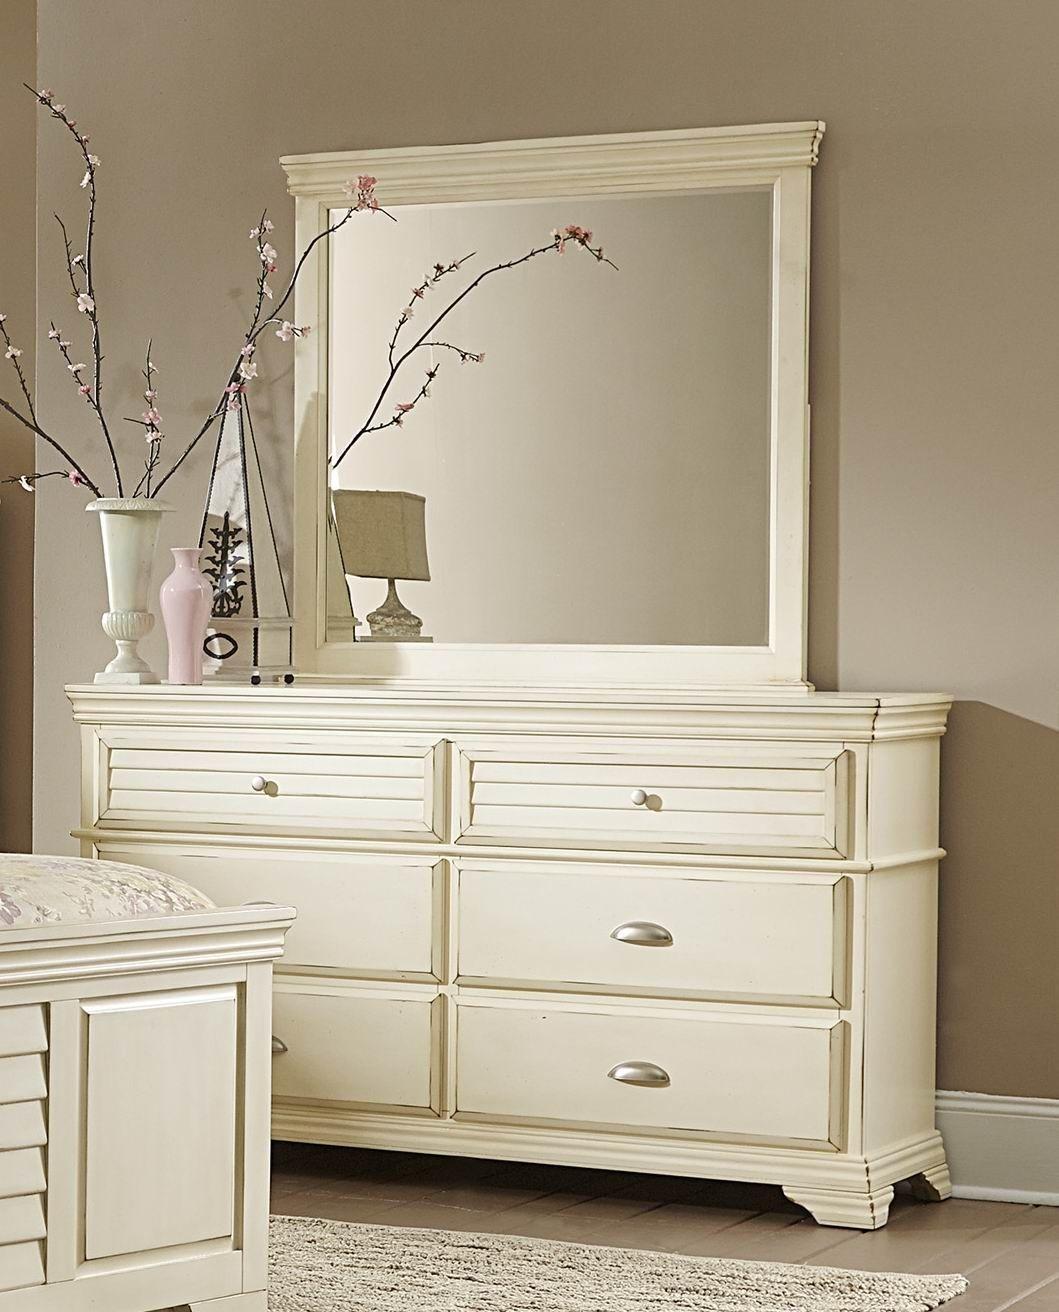 laurinda antique white panel bedroom set from homelegance 1846 1